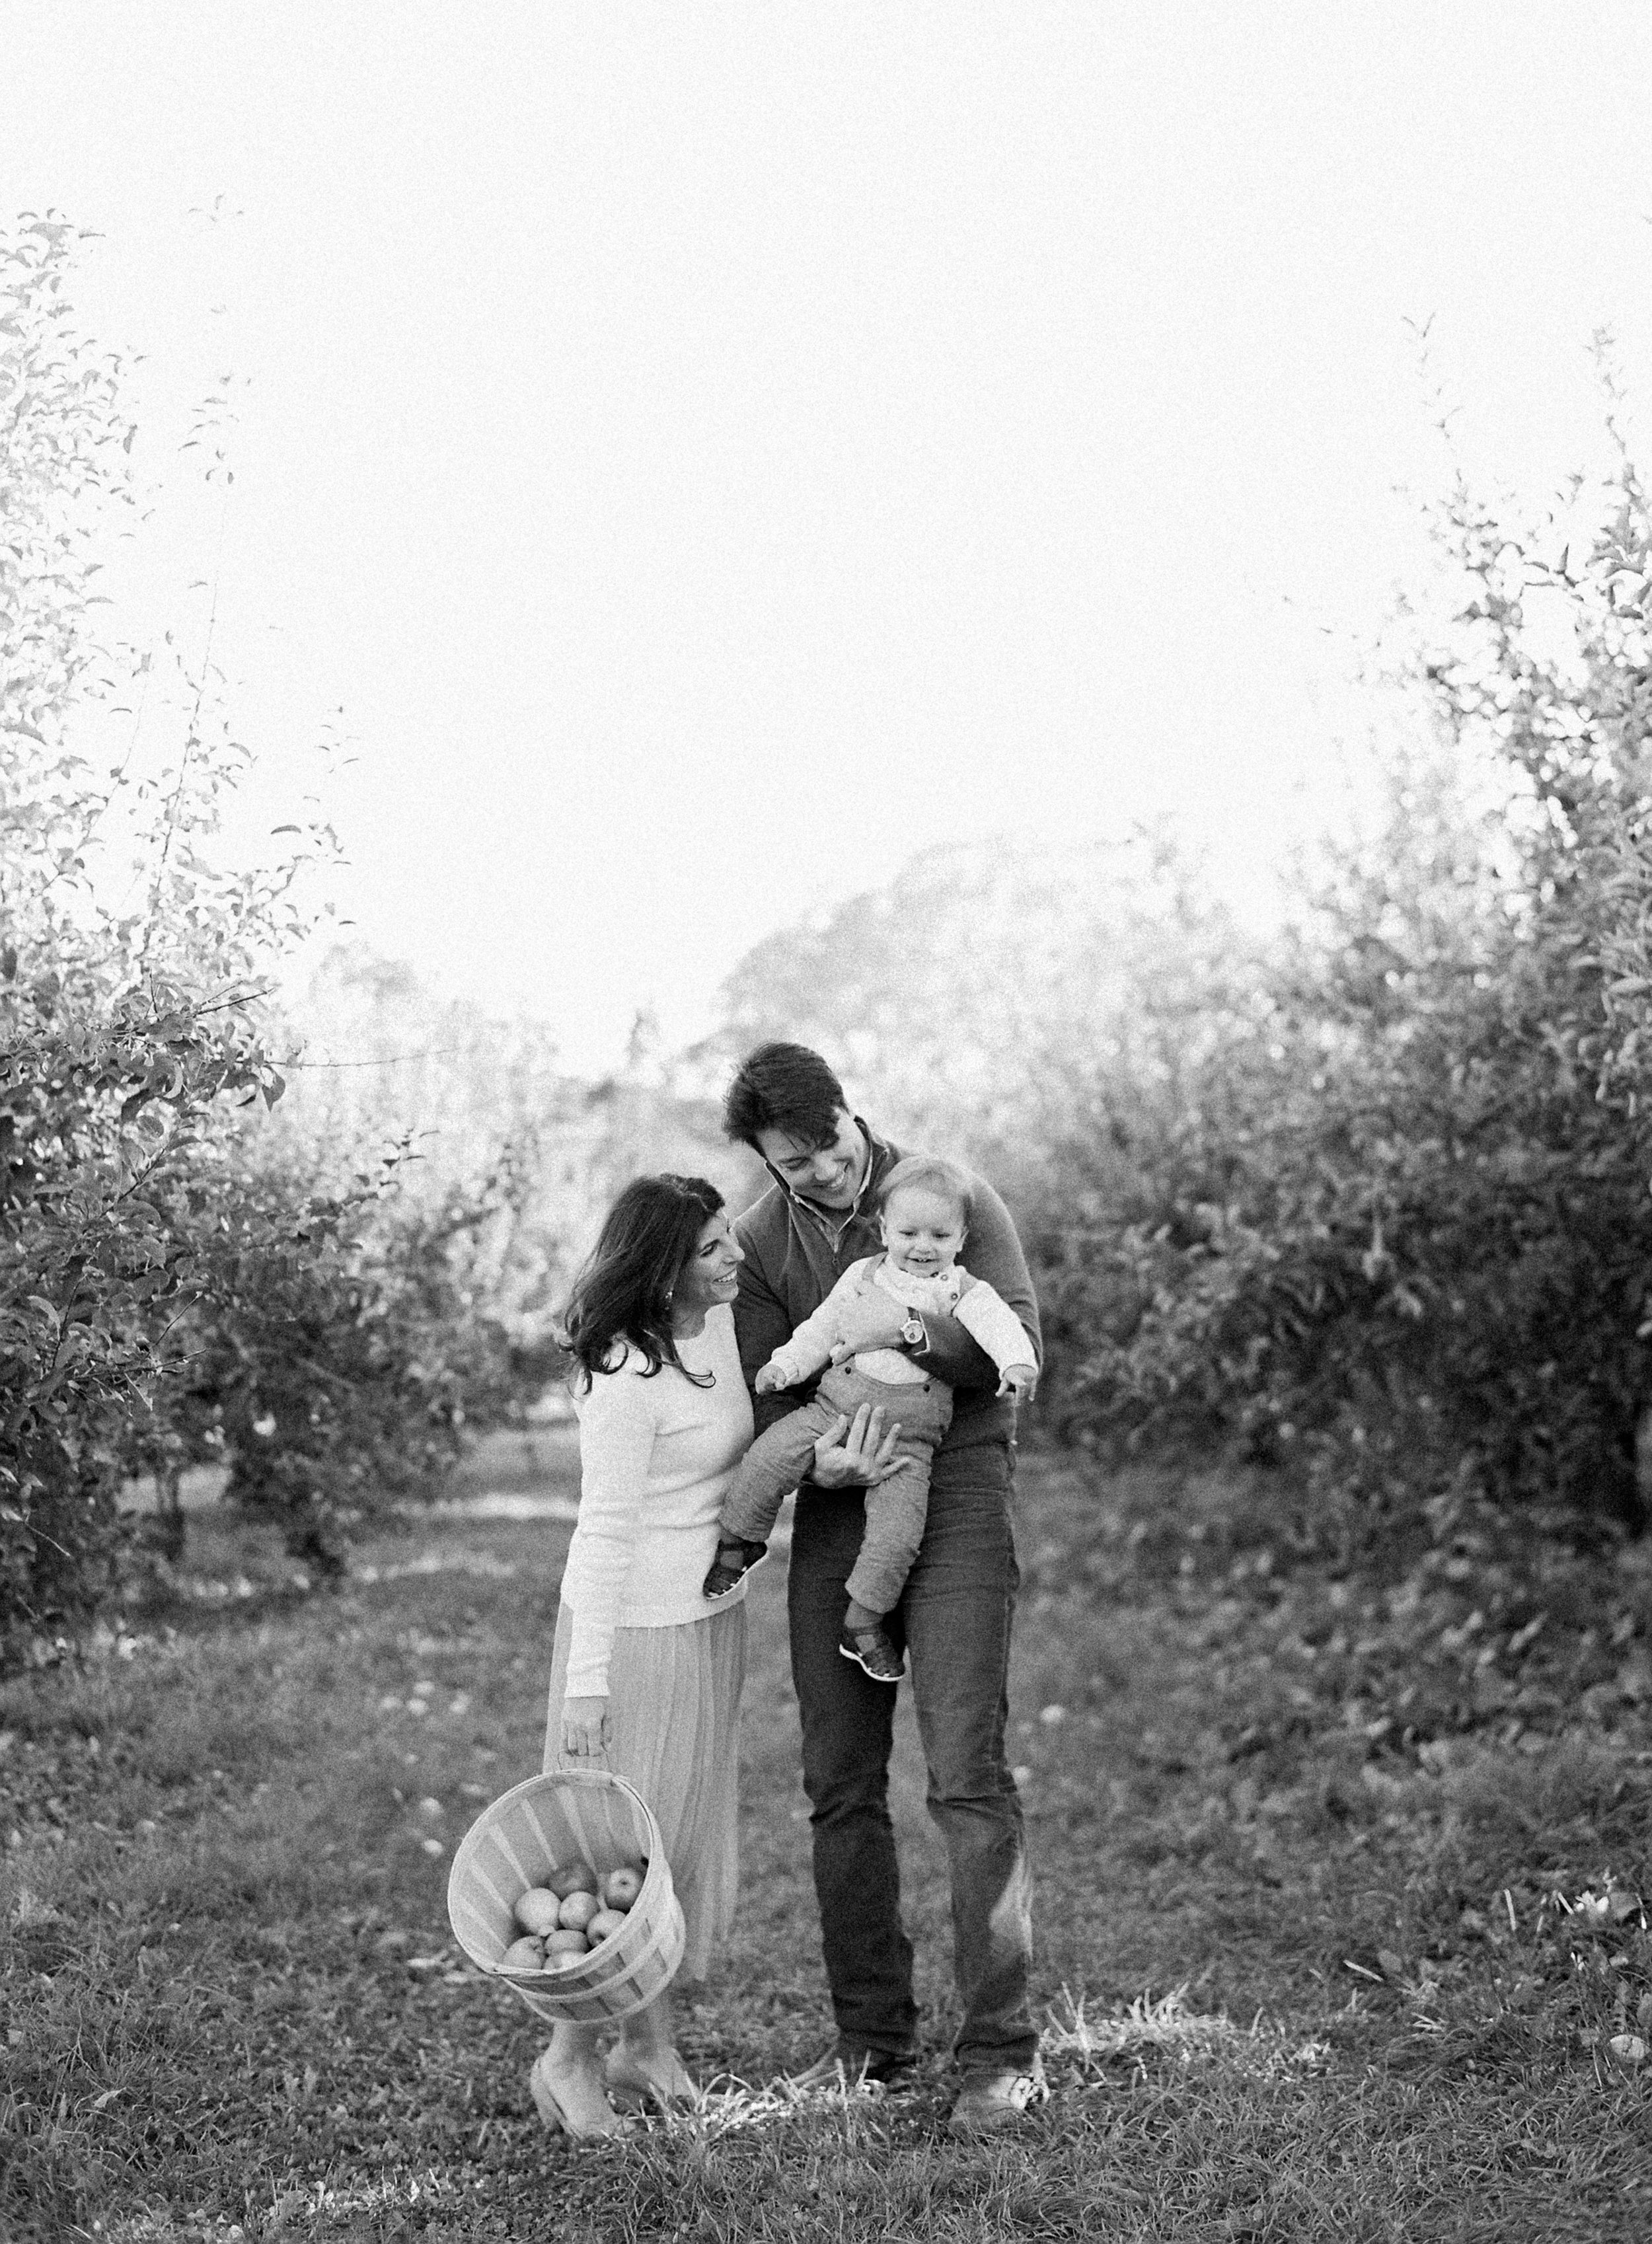 Isaac-Family-149-Jen-Huang-008744-R1-011.jpg